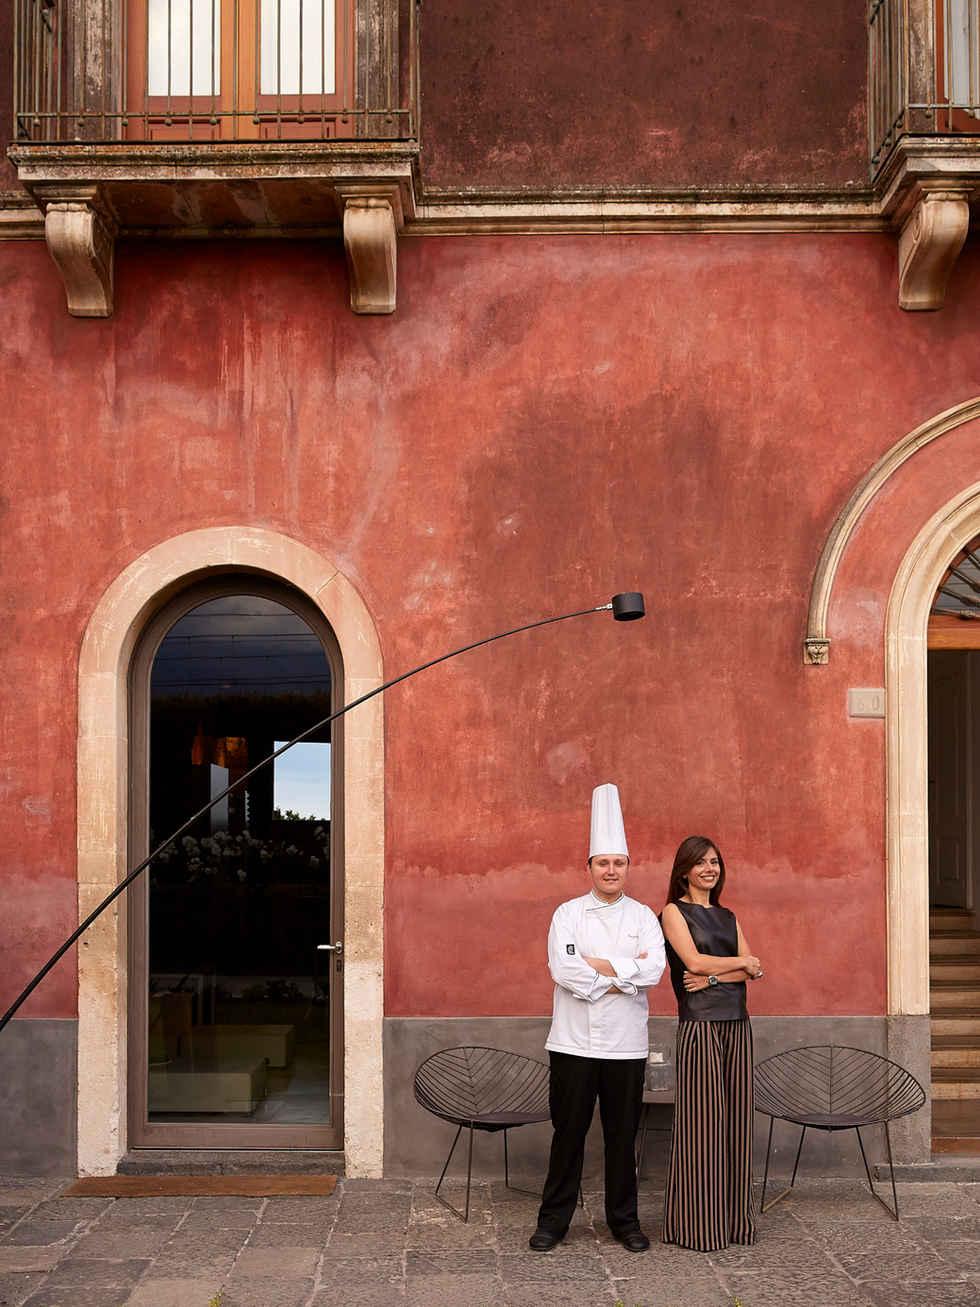 Carla Maugeri & Giuseppe Raciti @ Zash